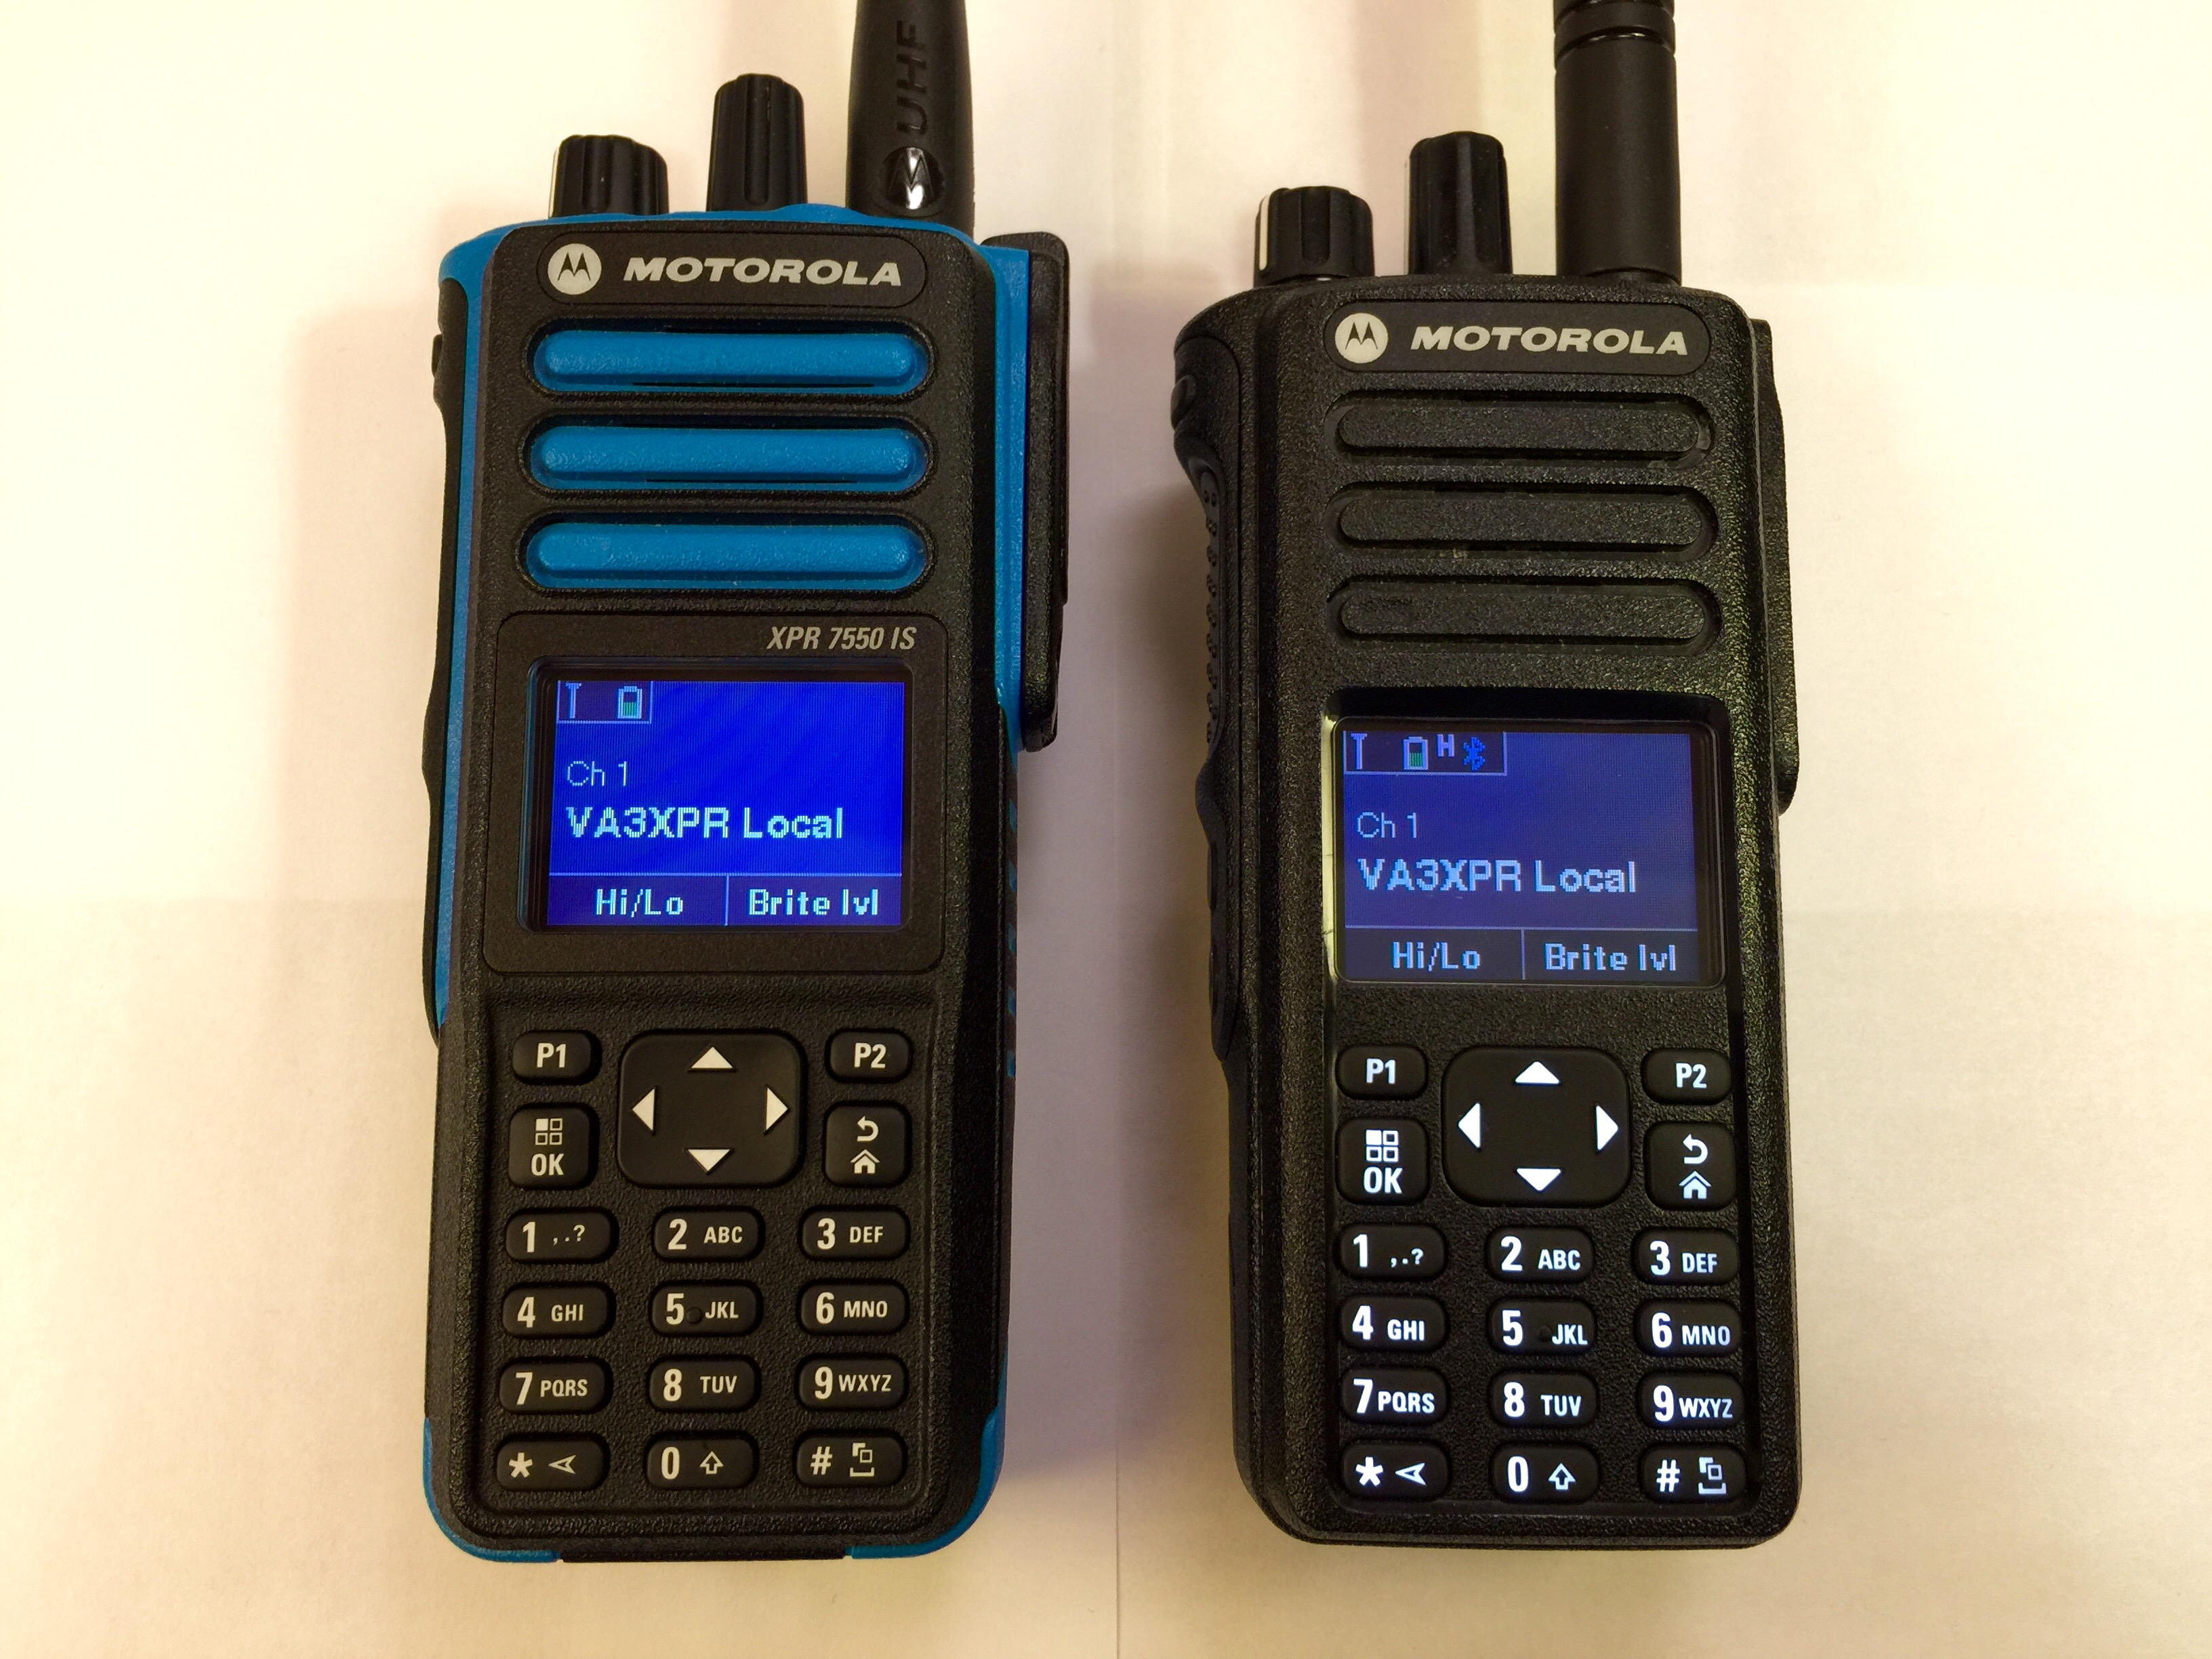 Motorola XPR Series portable